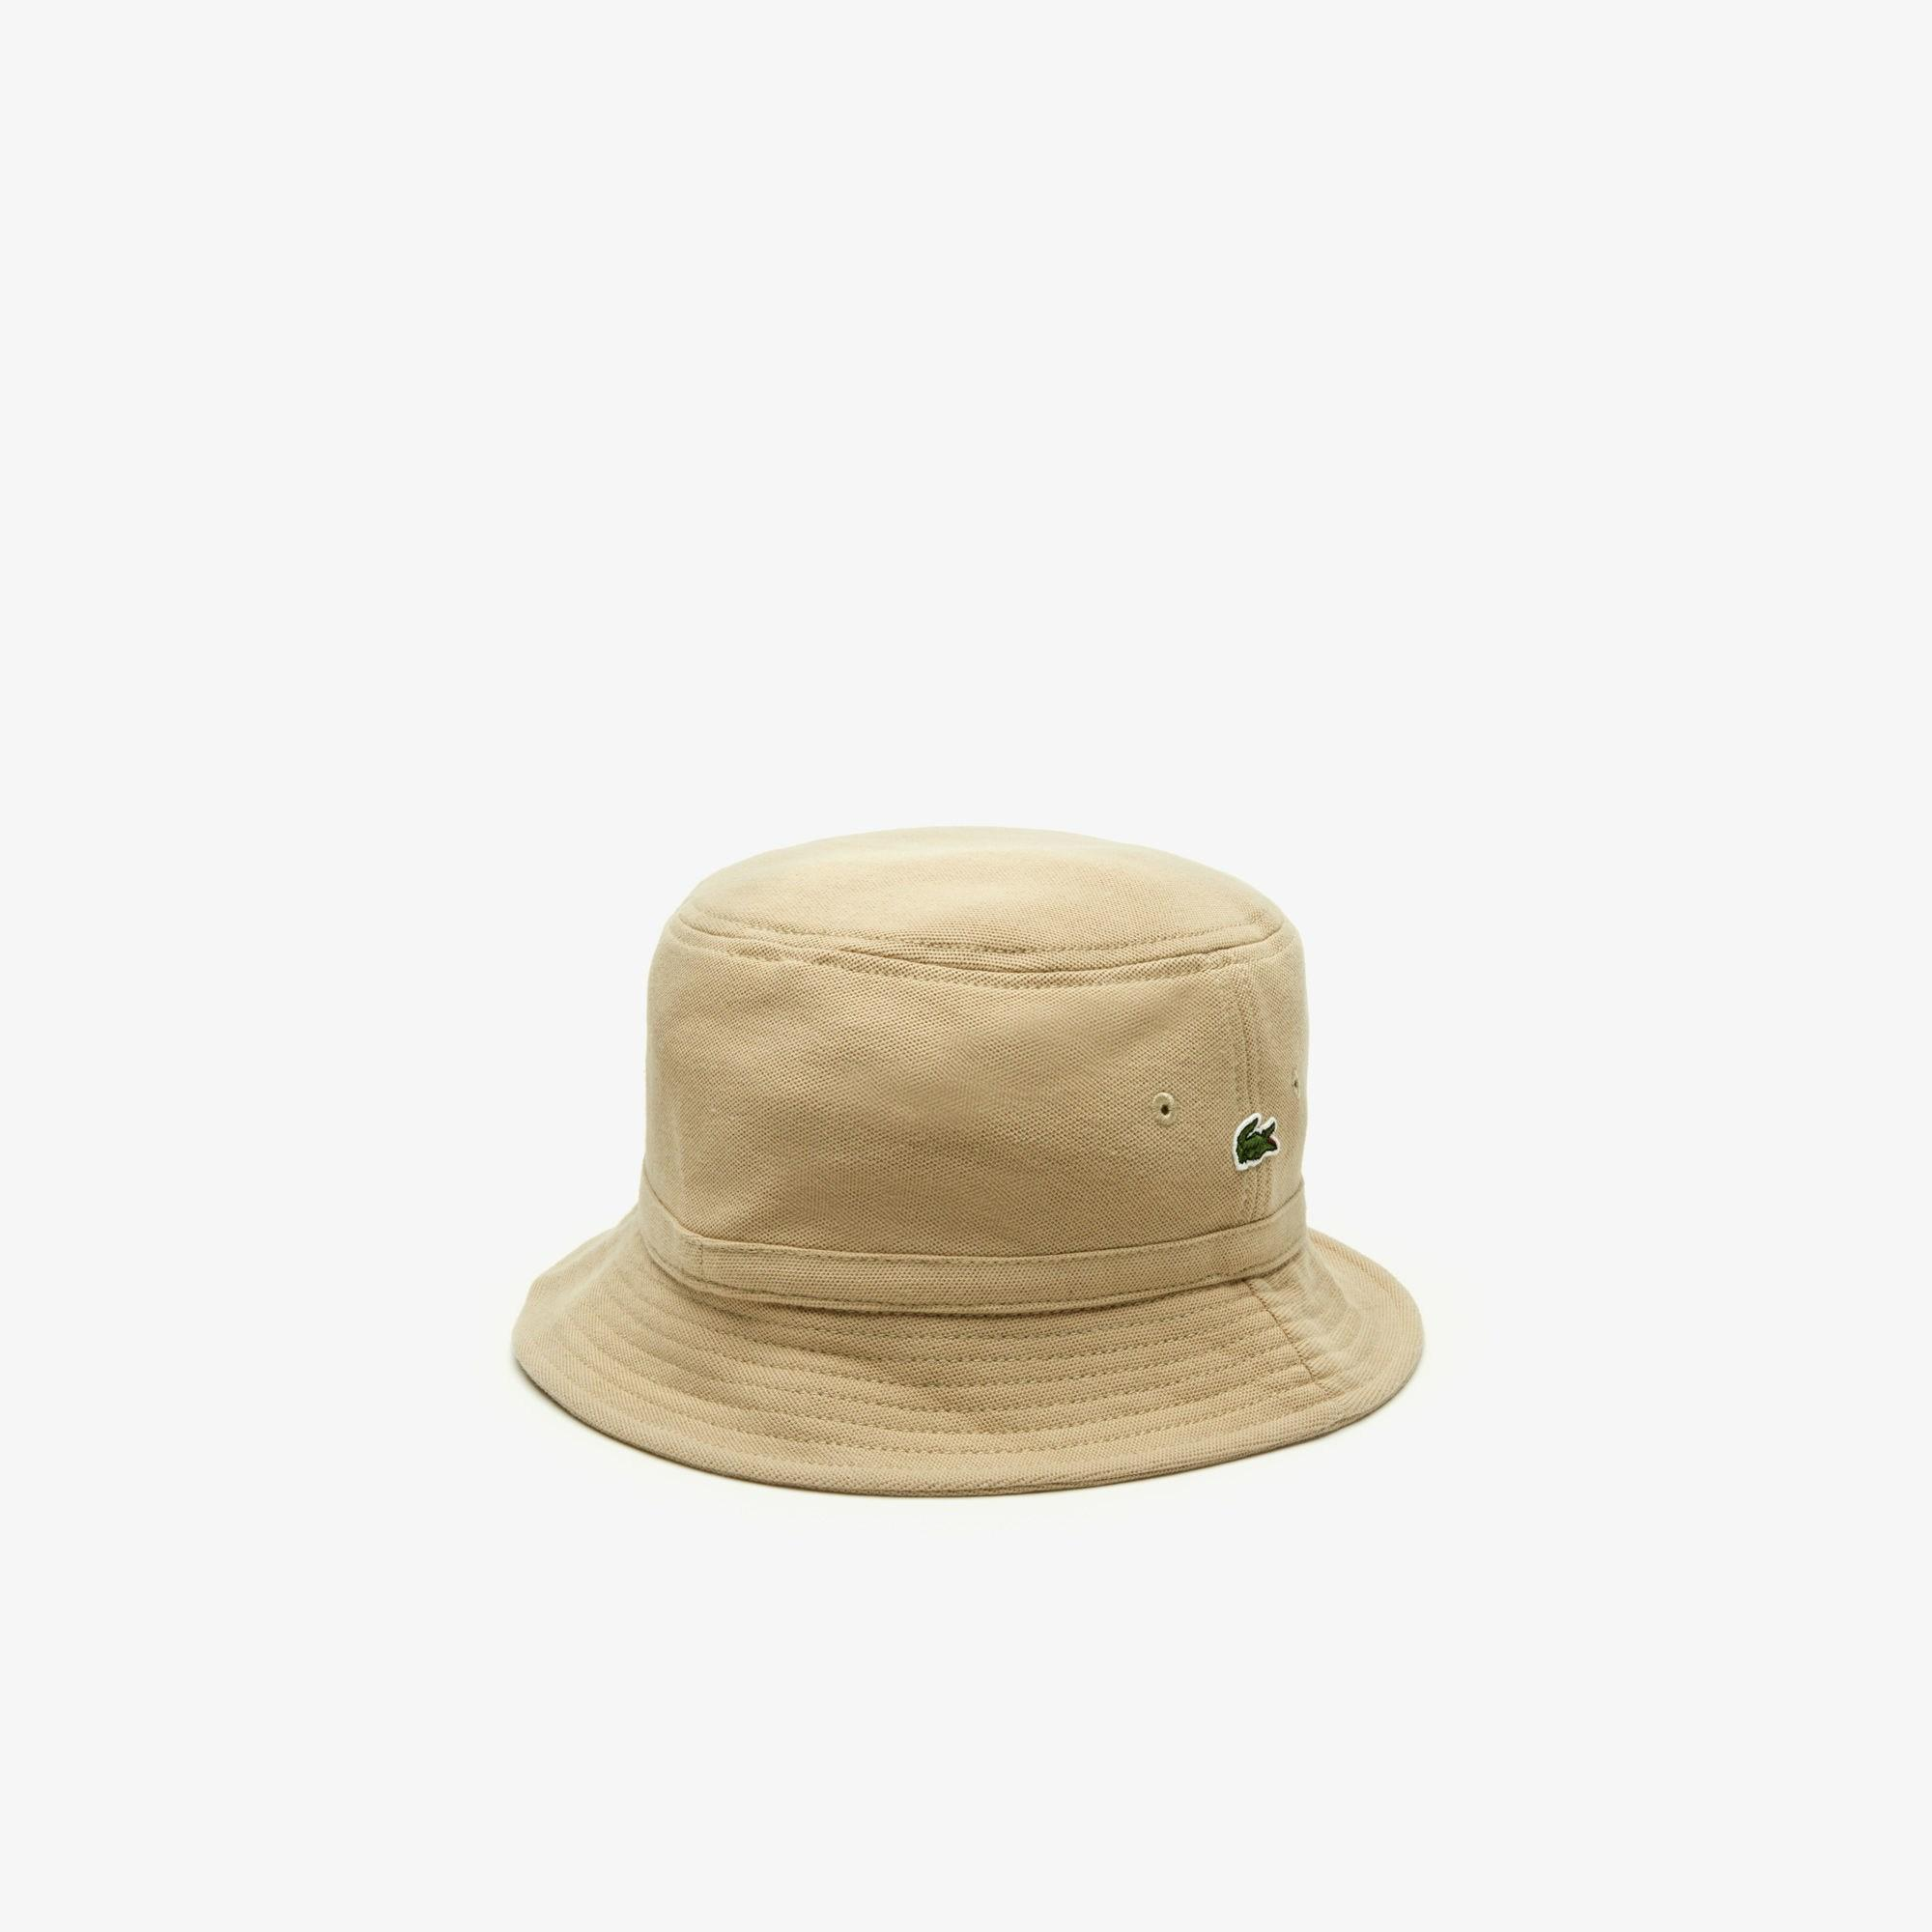 d92aa0ad Lacoste - Natural Cotton Piqué Bucket Hat for Men - Lyst. View fullscreen